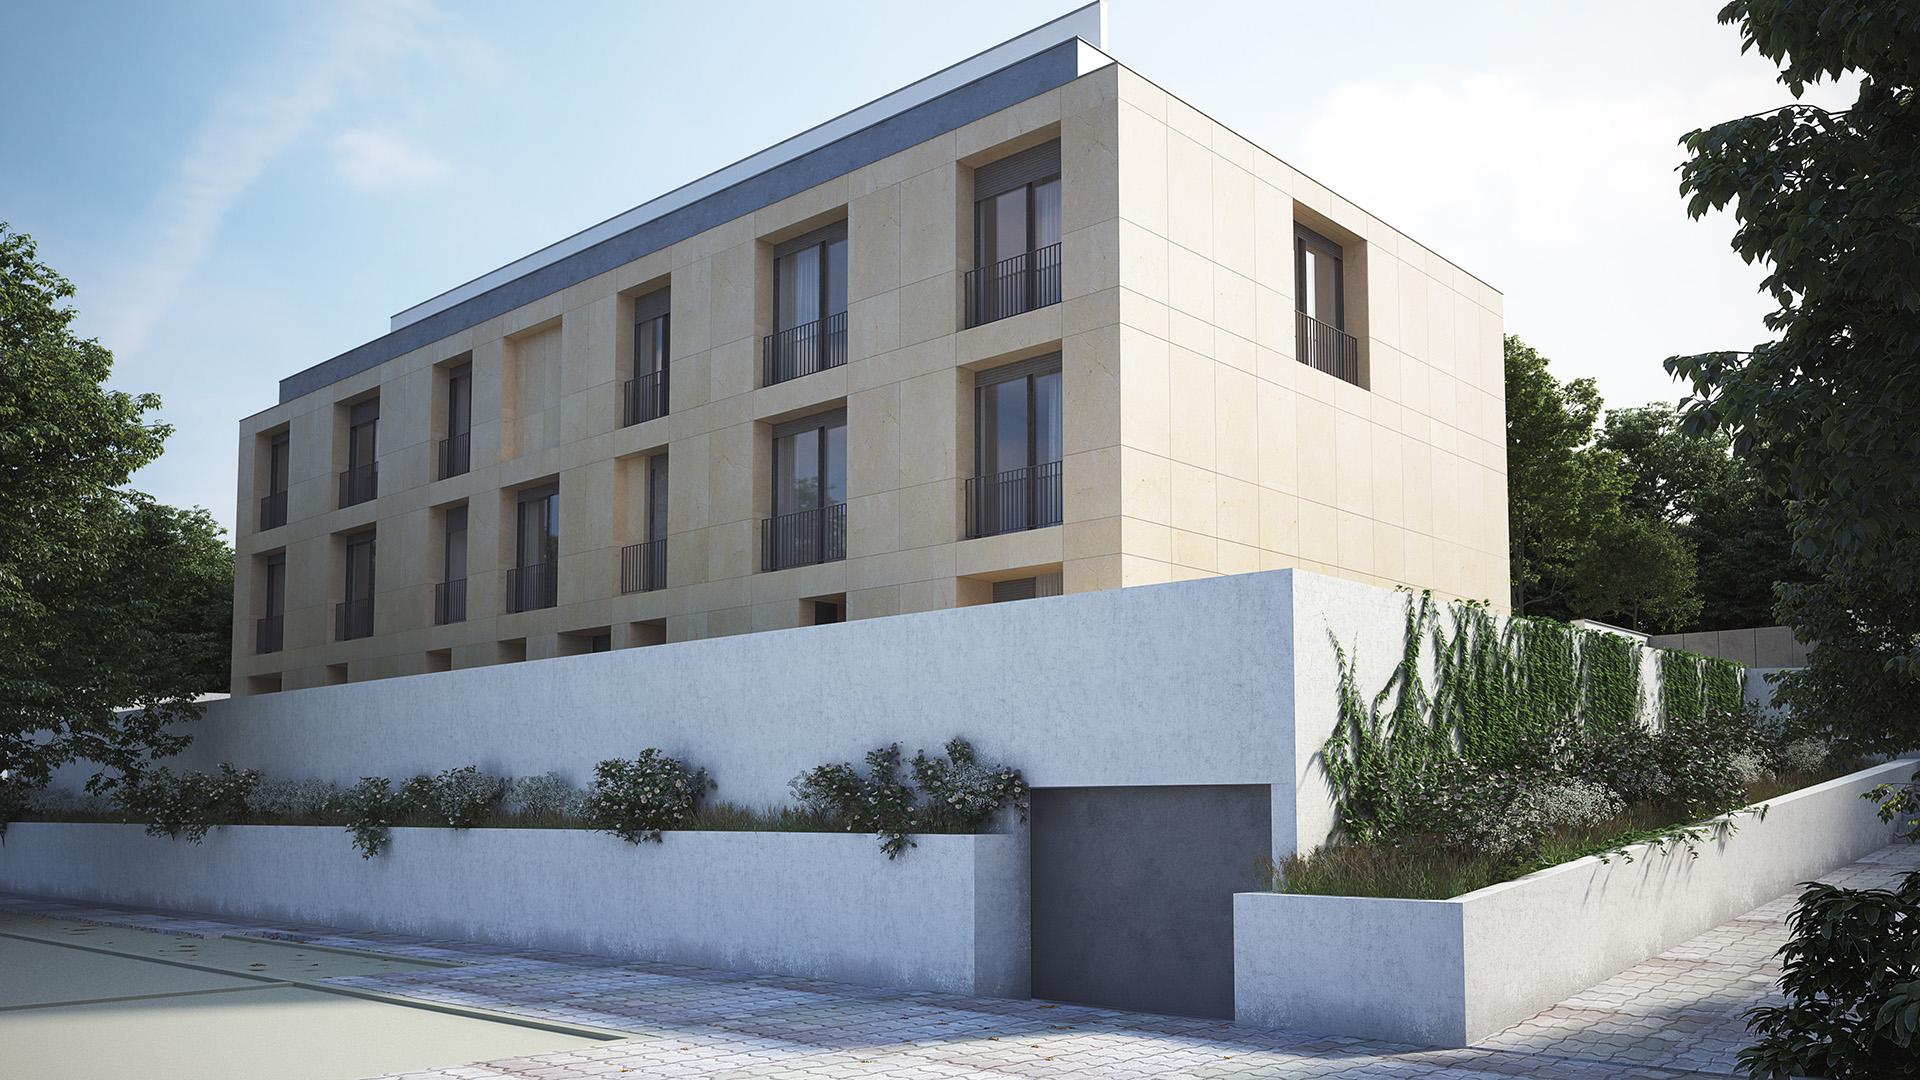 Realplano - Casas de Nevogilde